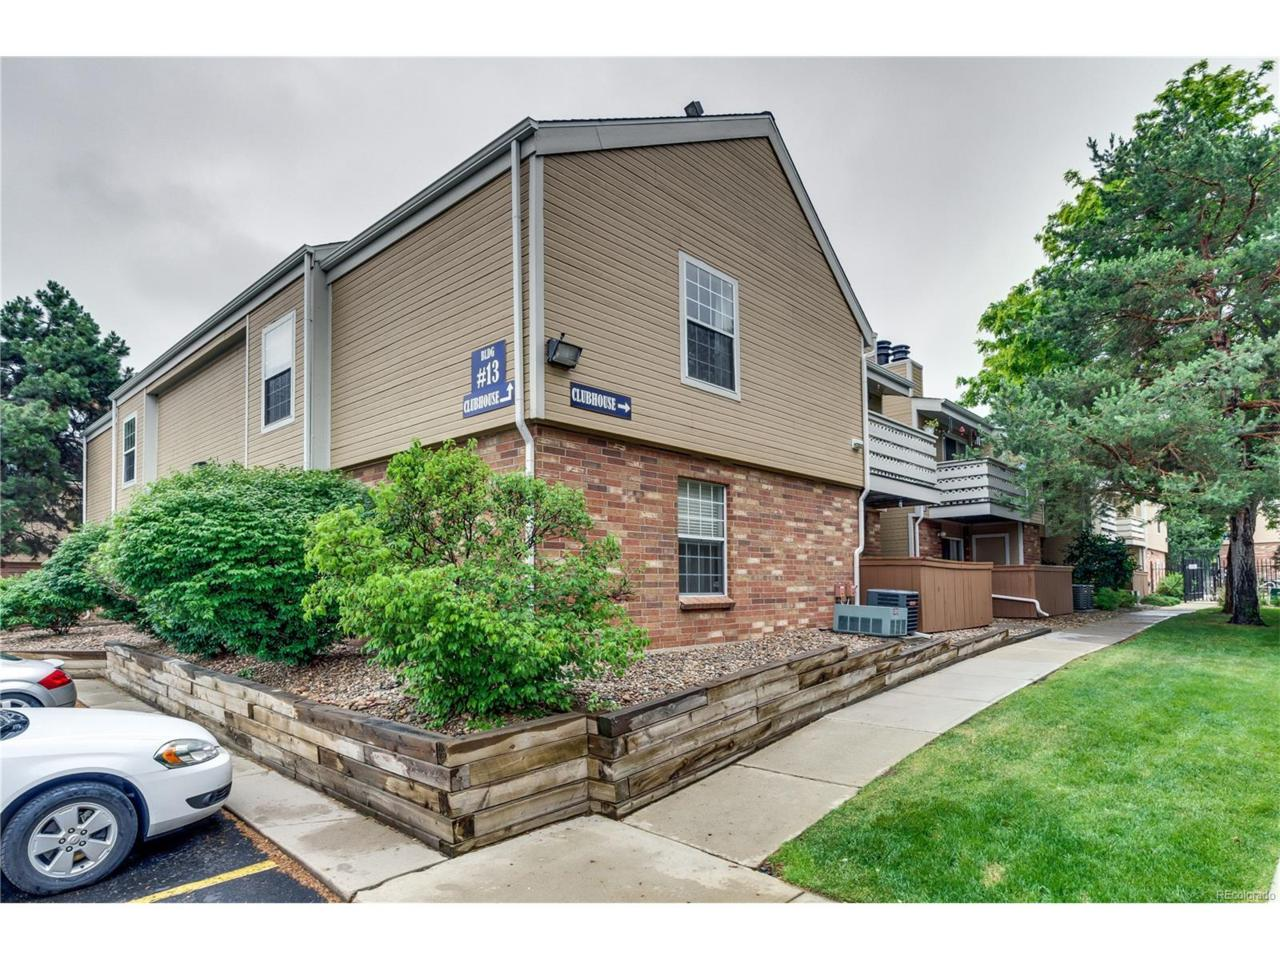 3334 S Ammons Street #204, Lakewood, CO 80227 (MLS #3450830) :: 8z Real Estate